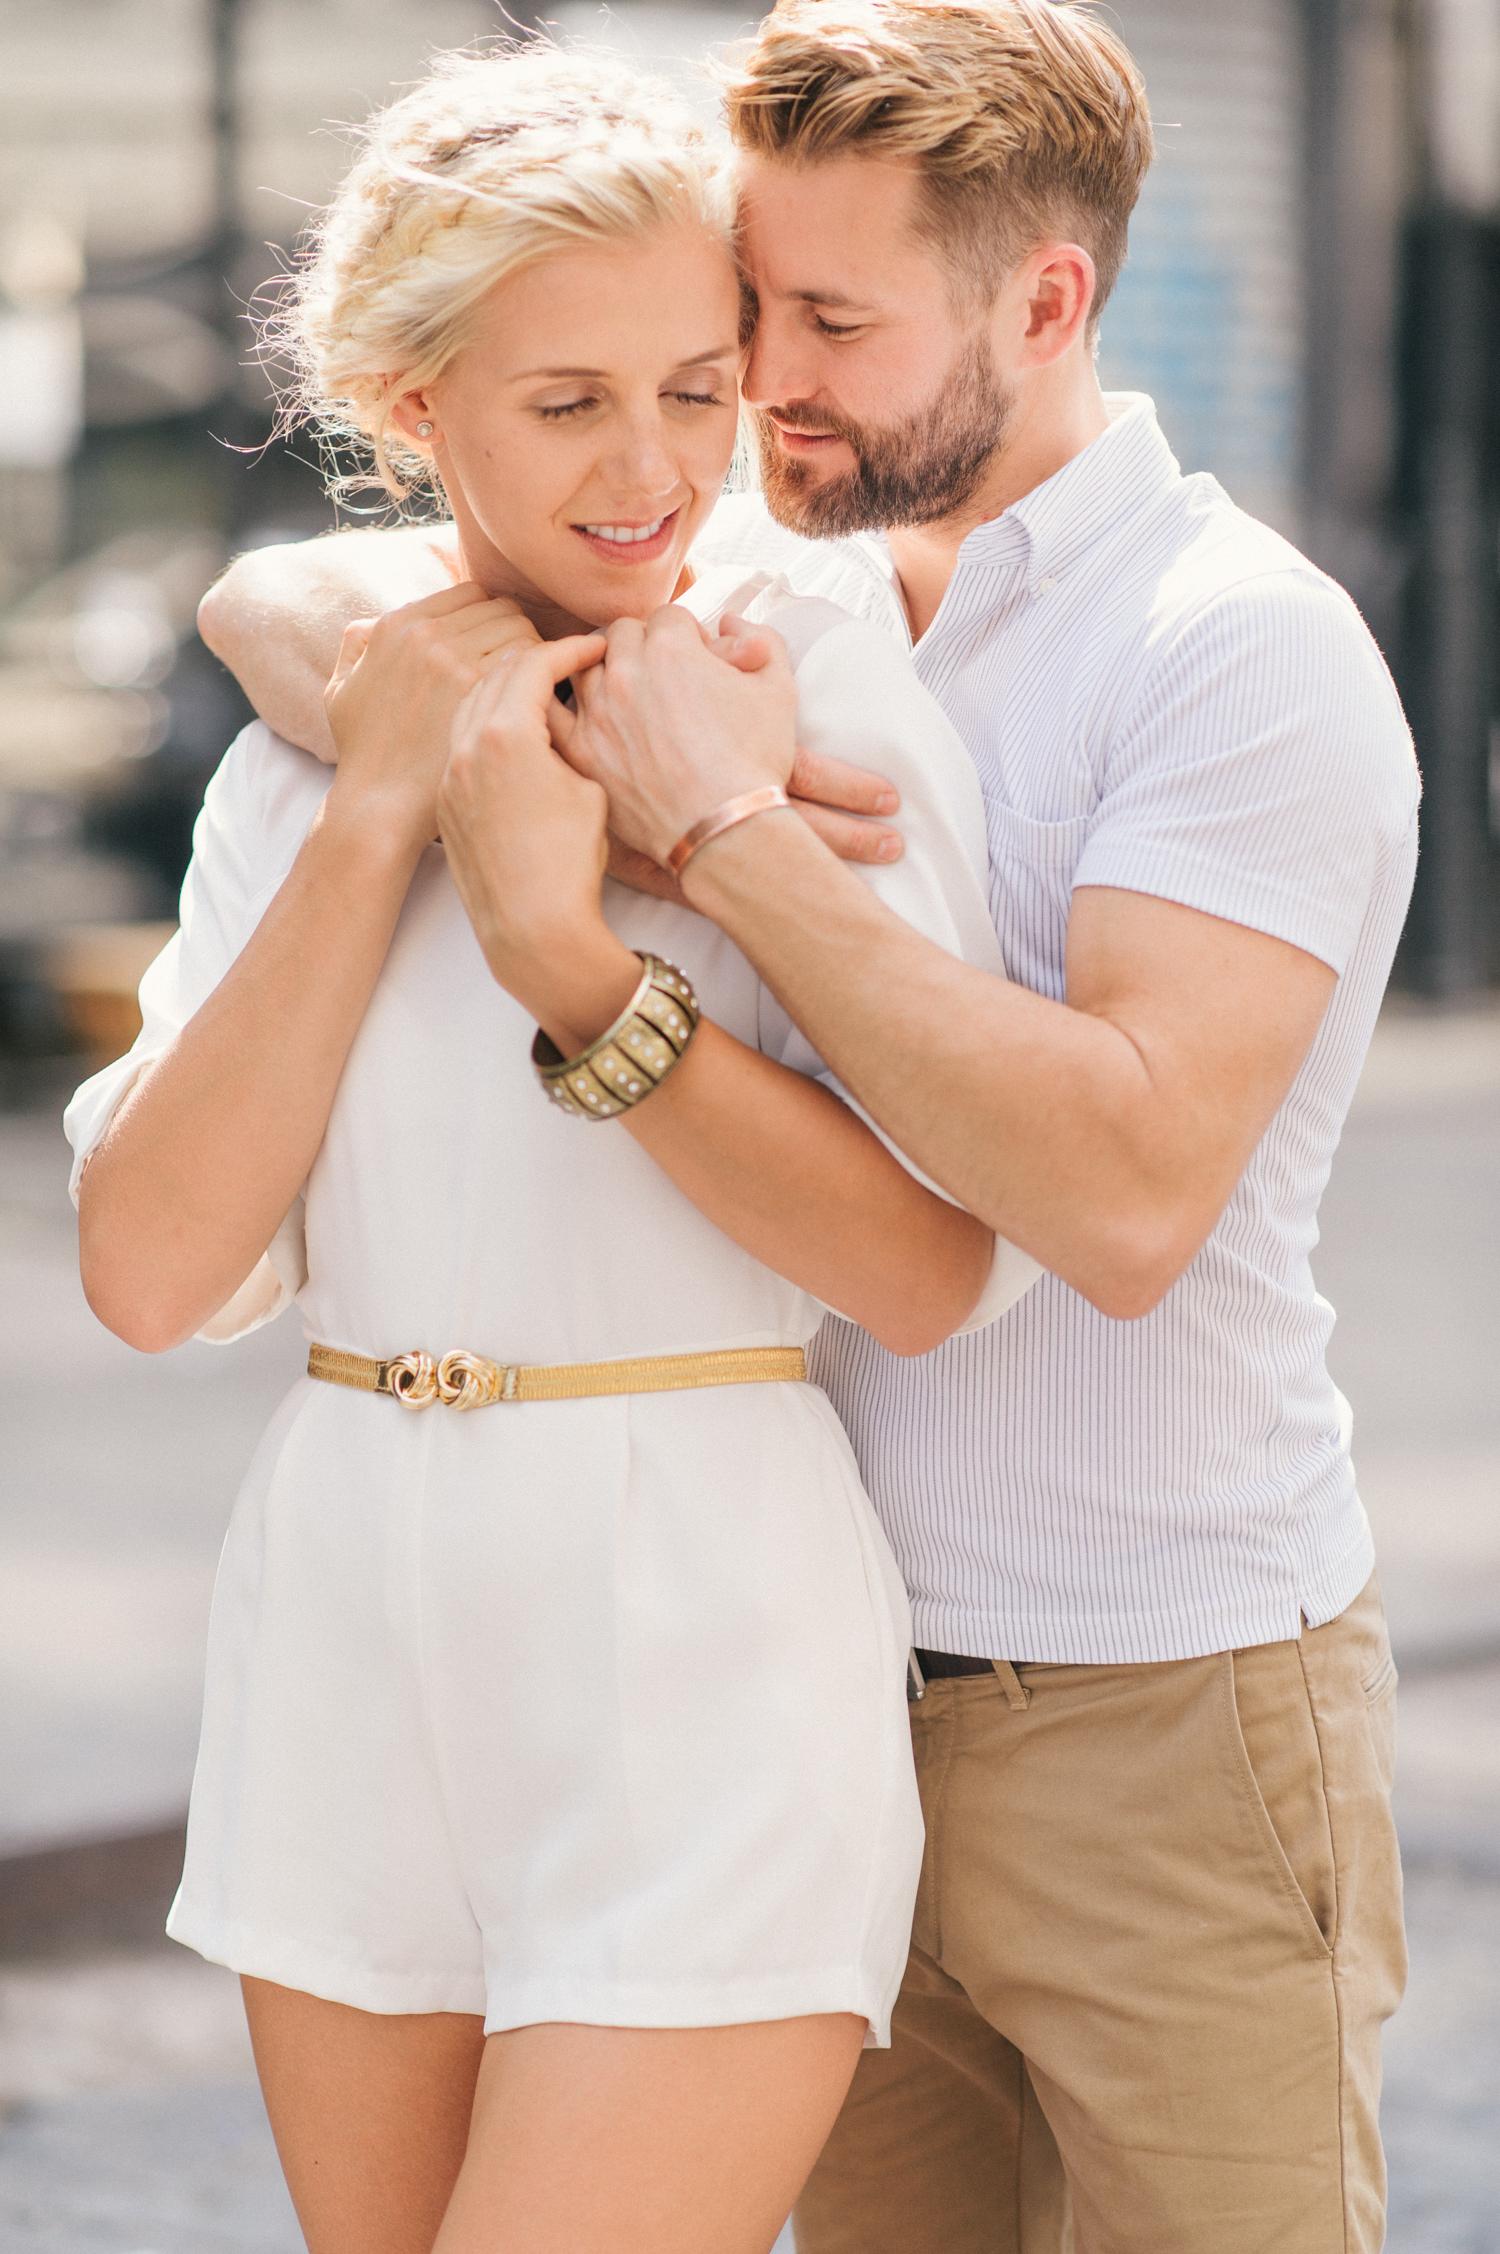 SoHoManhattan.Engagements.NYC3.jpg